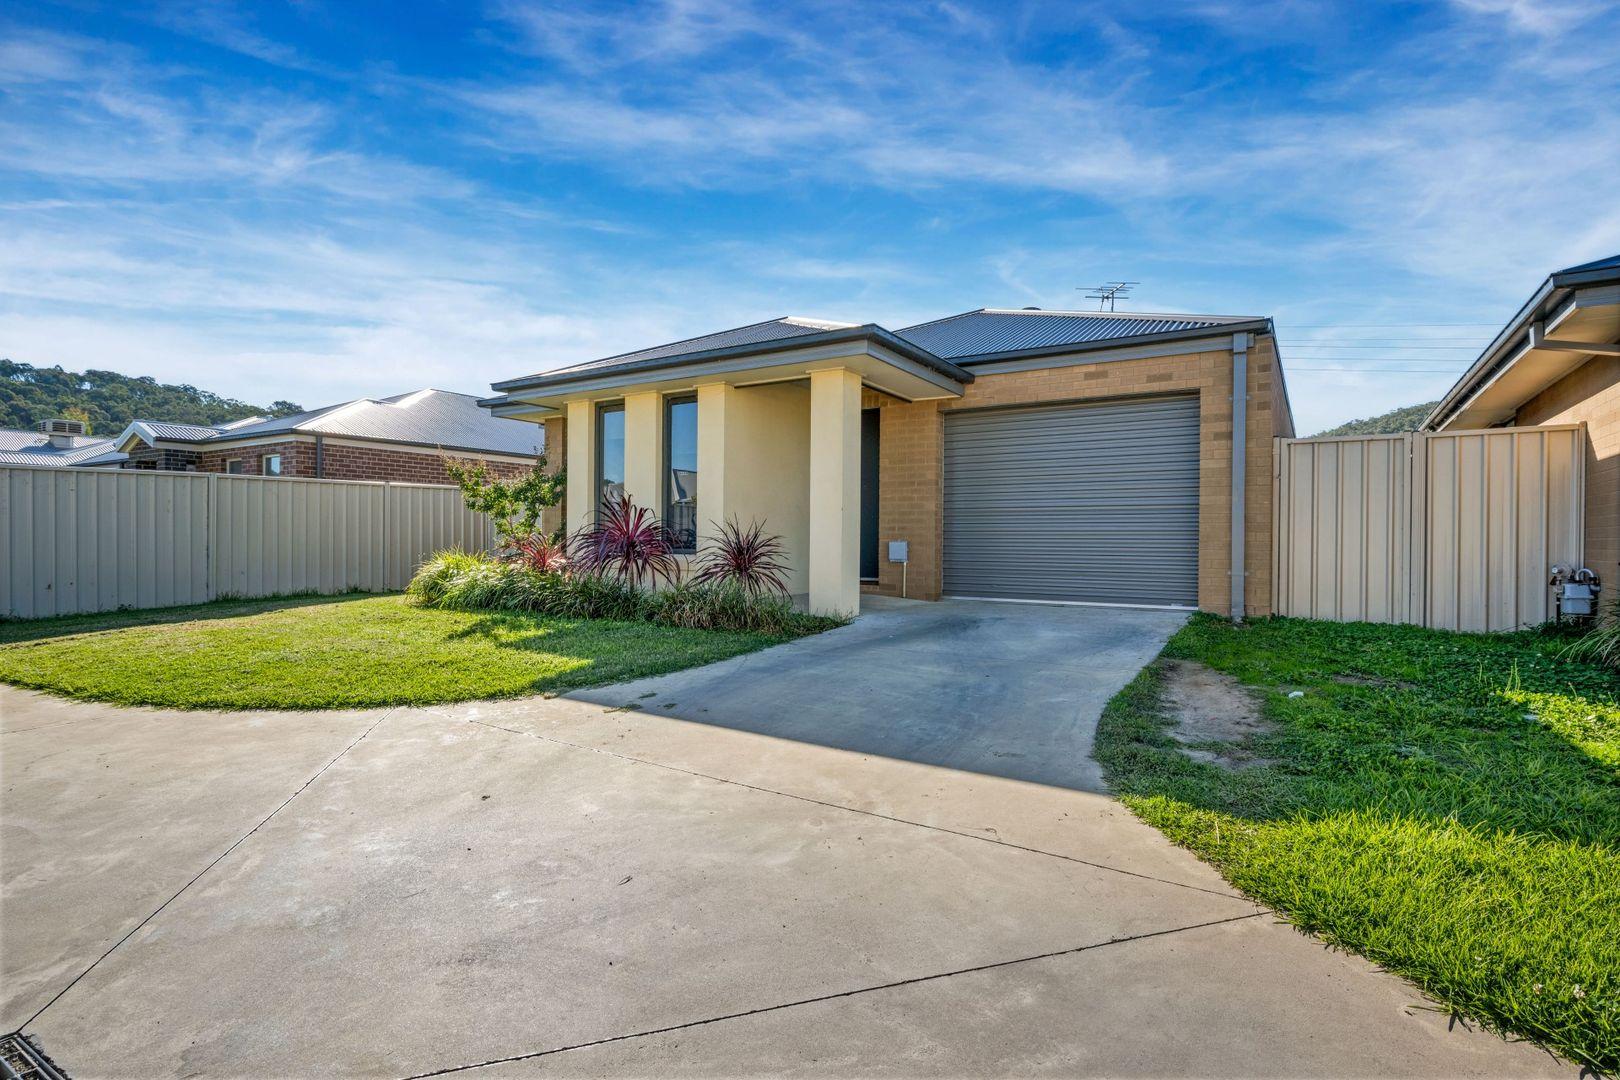 3/47 Hanrahan Street, Hamilton Valley NSW 2641, Image 0